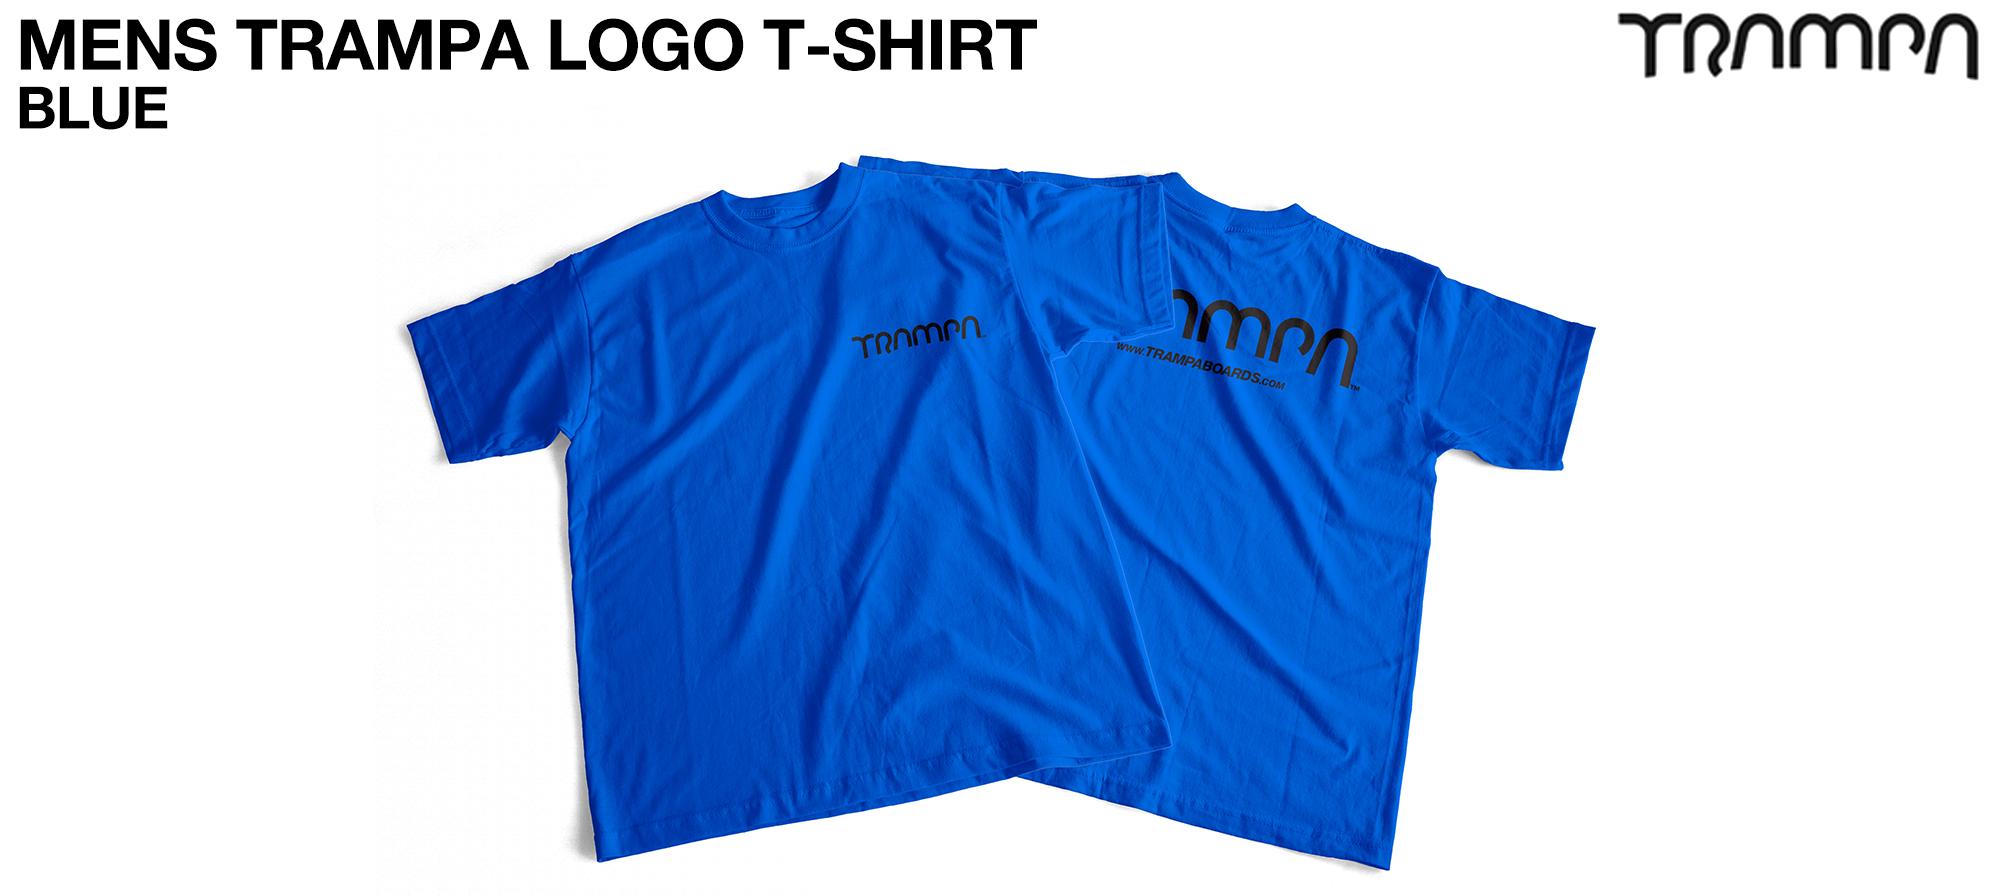 Gildan TRAMPA T-SHIRT - BLUE